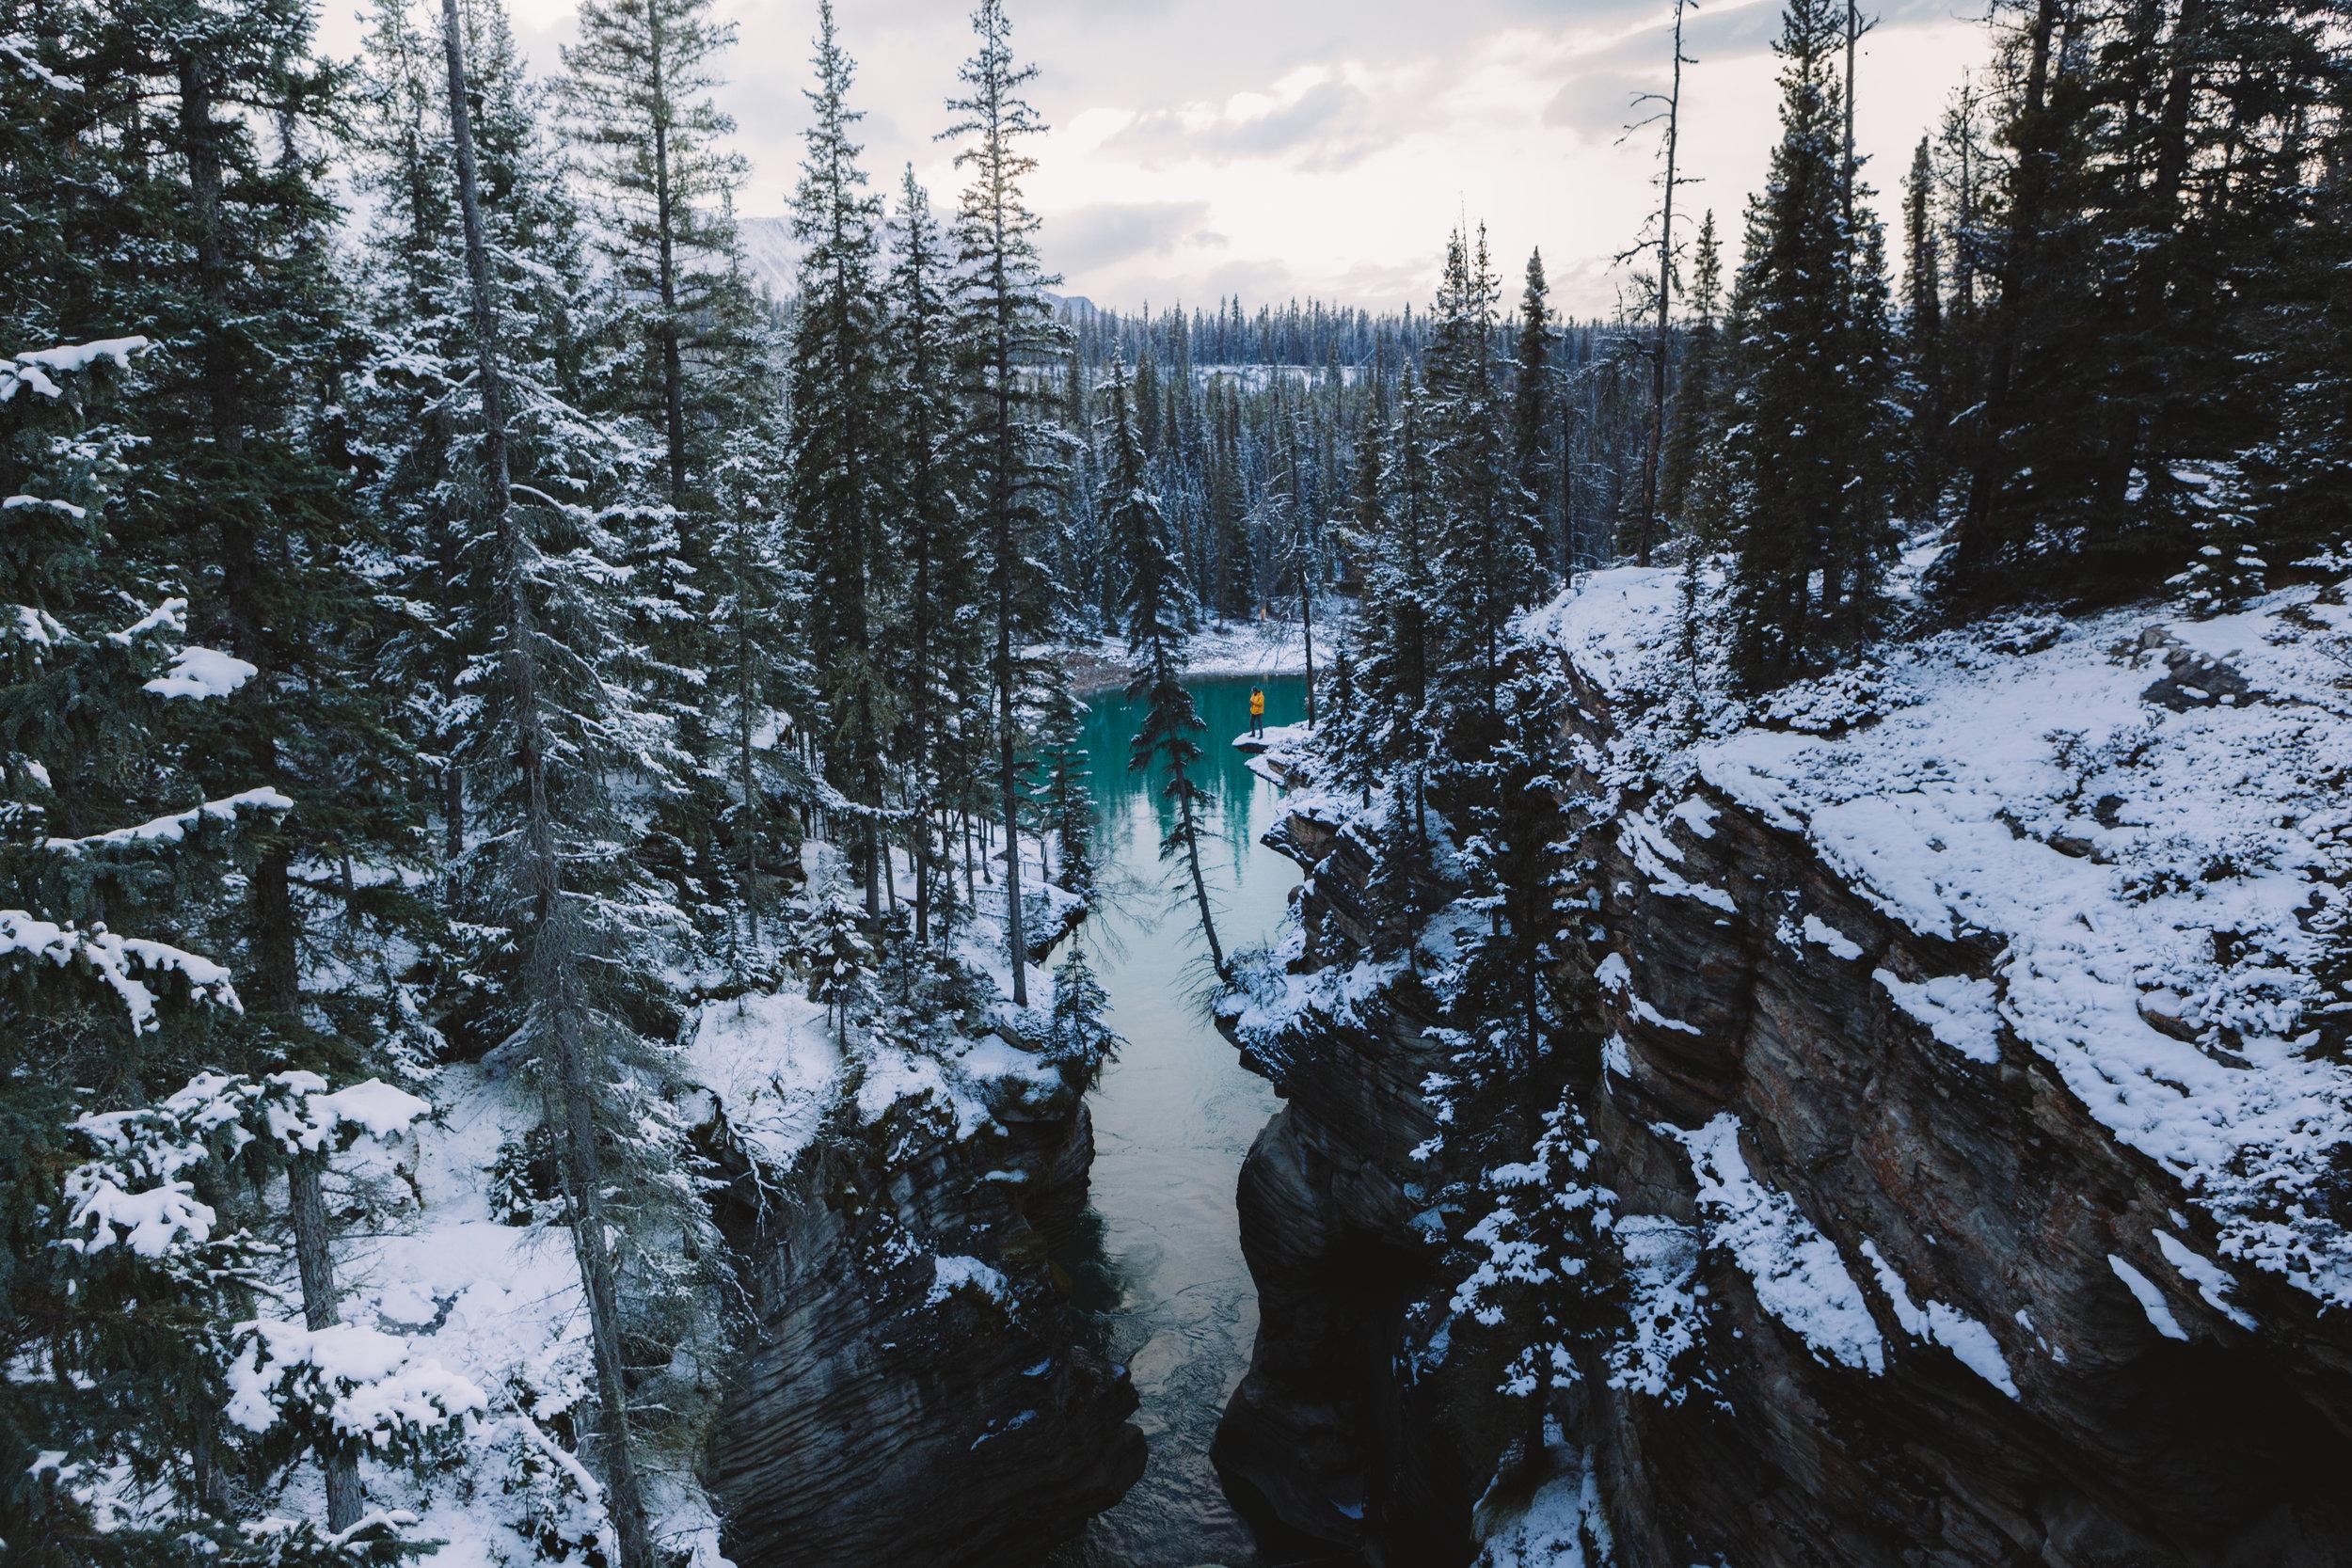 AthabascaFalls-7395.jpg